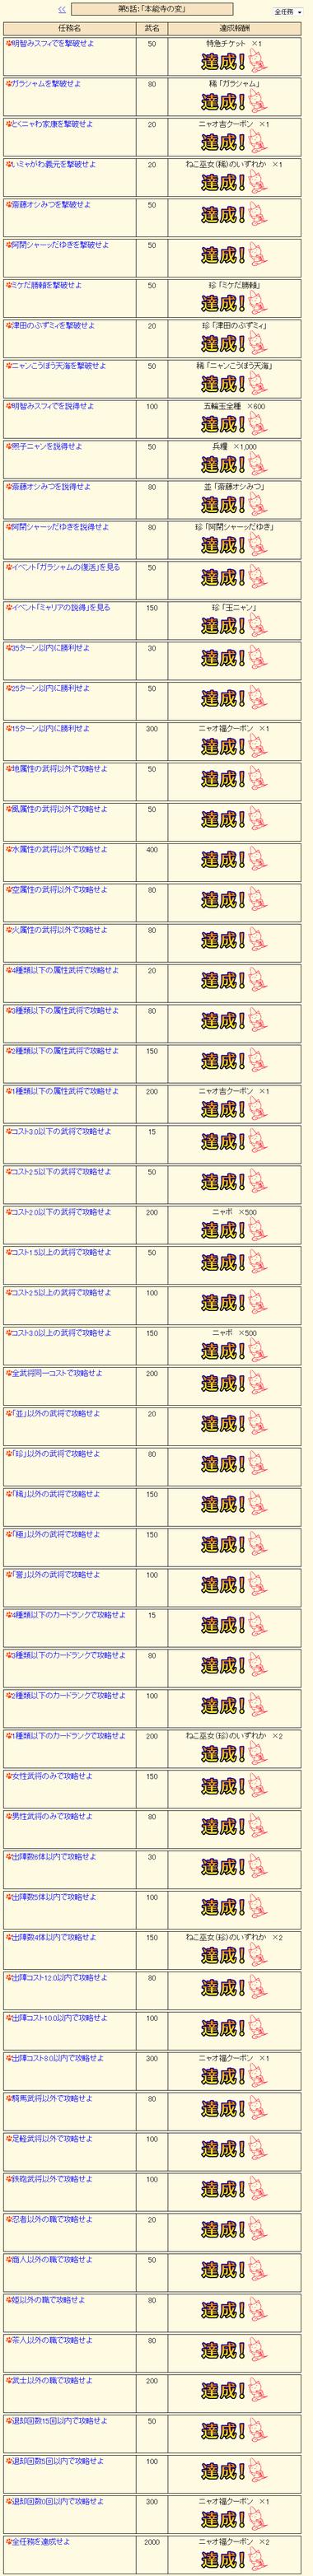 hon_complete